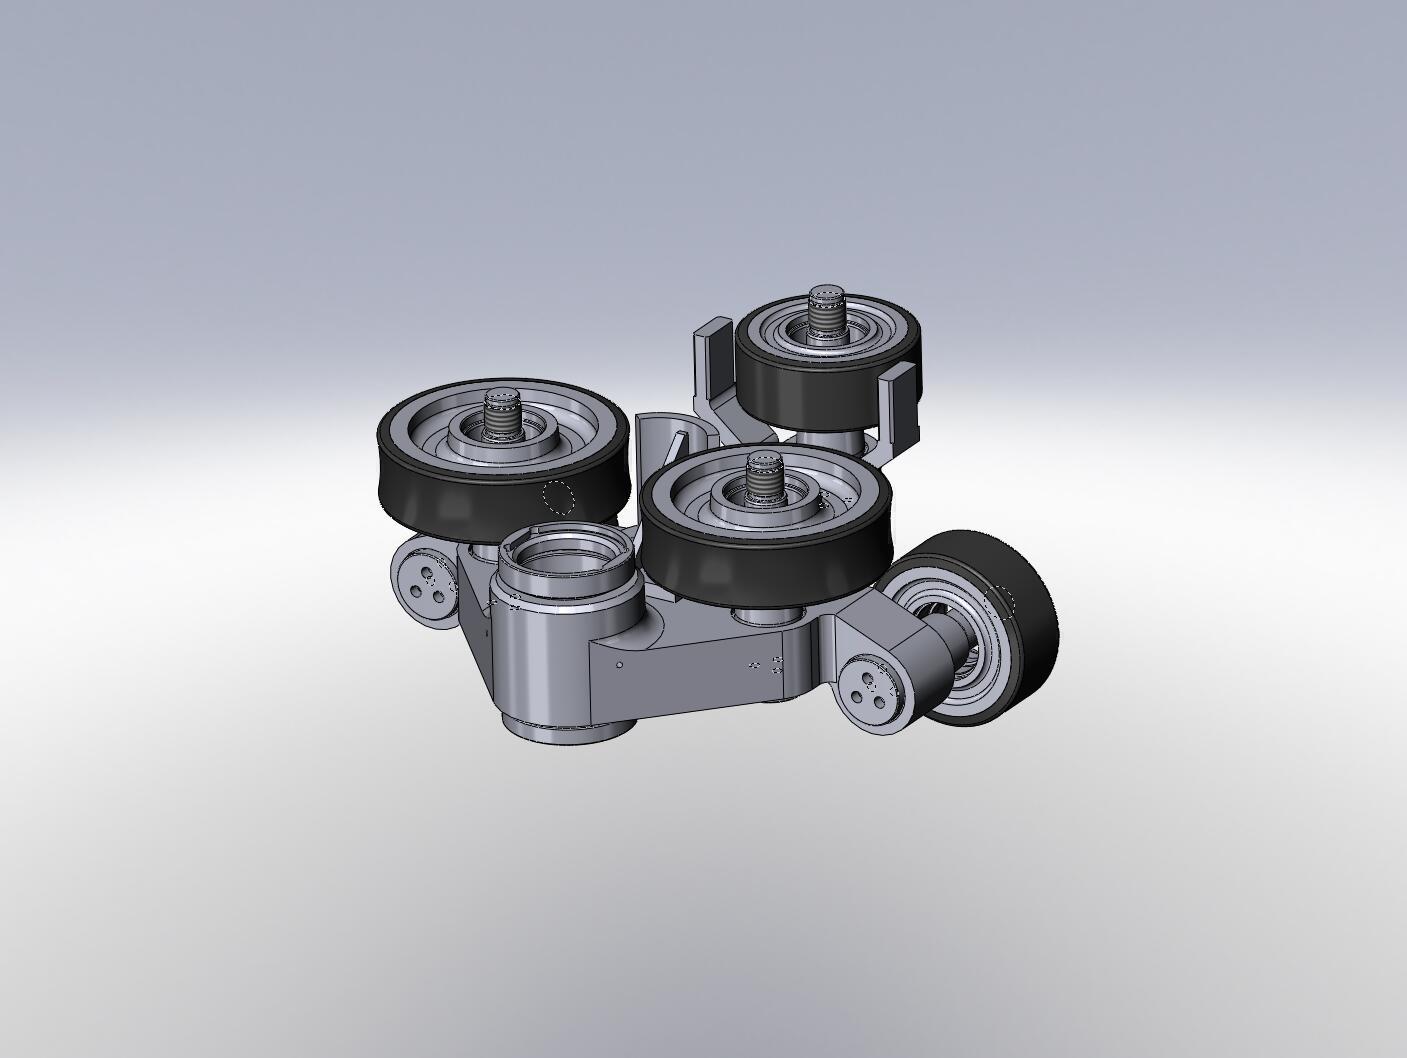 Coasters-101: Wheel Design - Coaster101